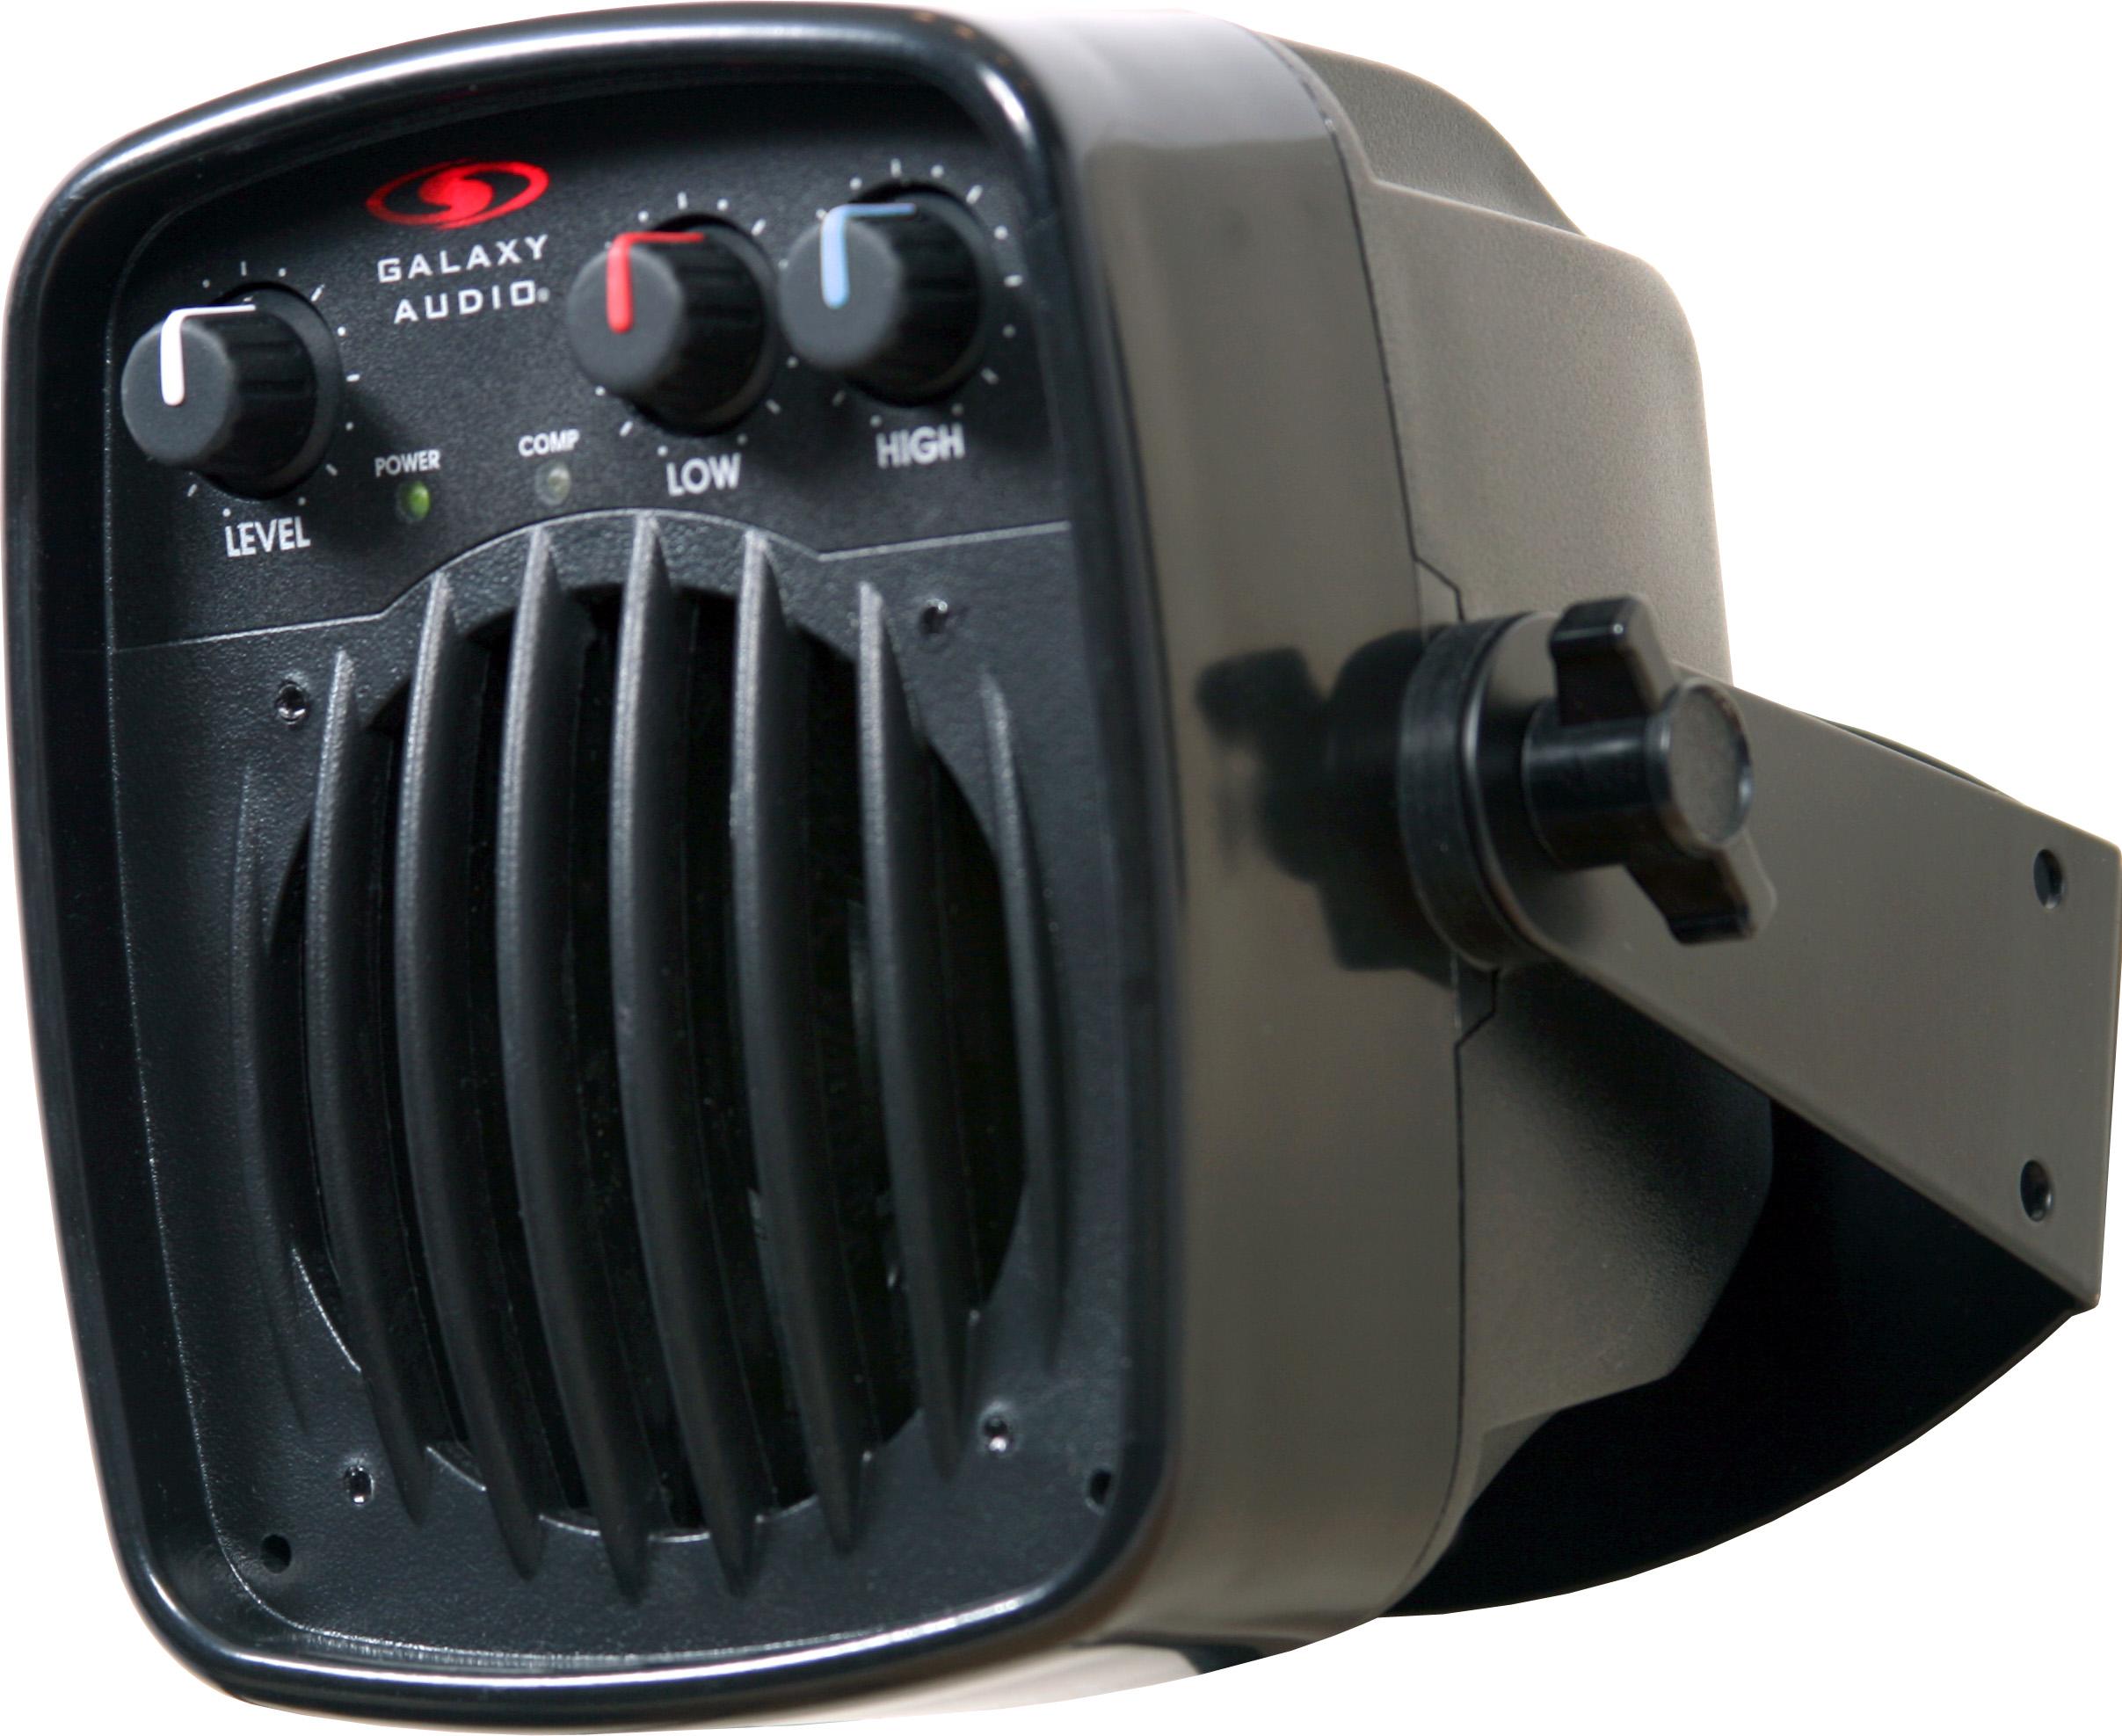 Galaxy Audio Nspa Professional Portable Nano Speaker